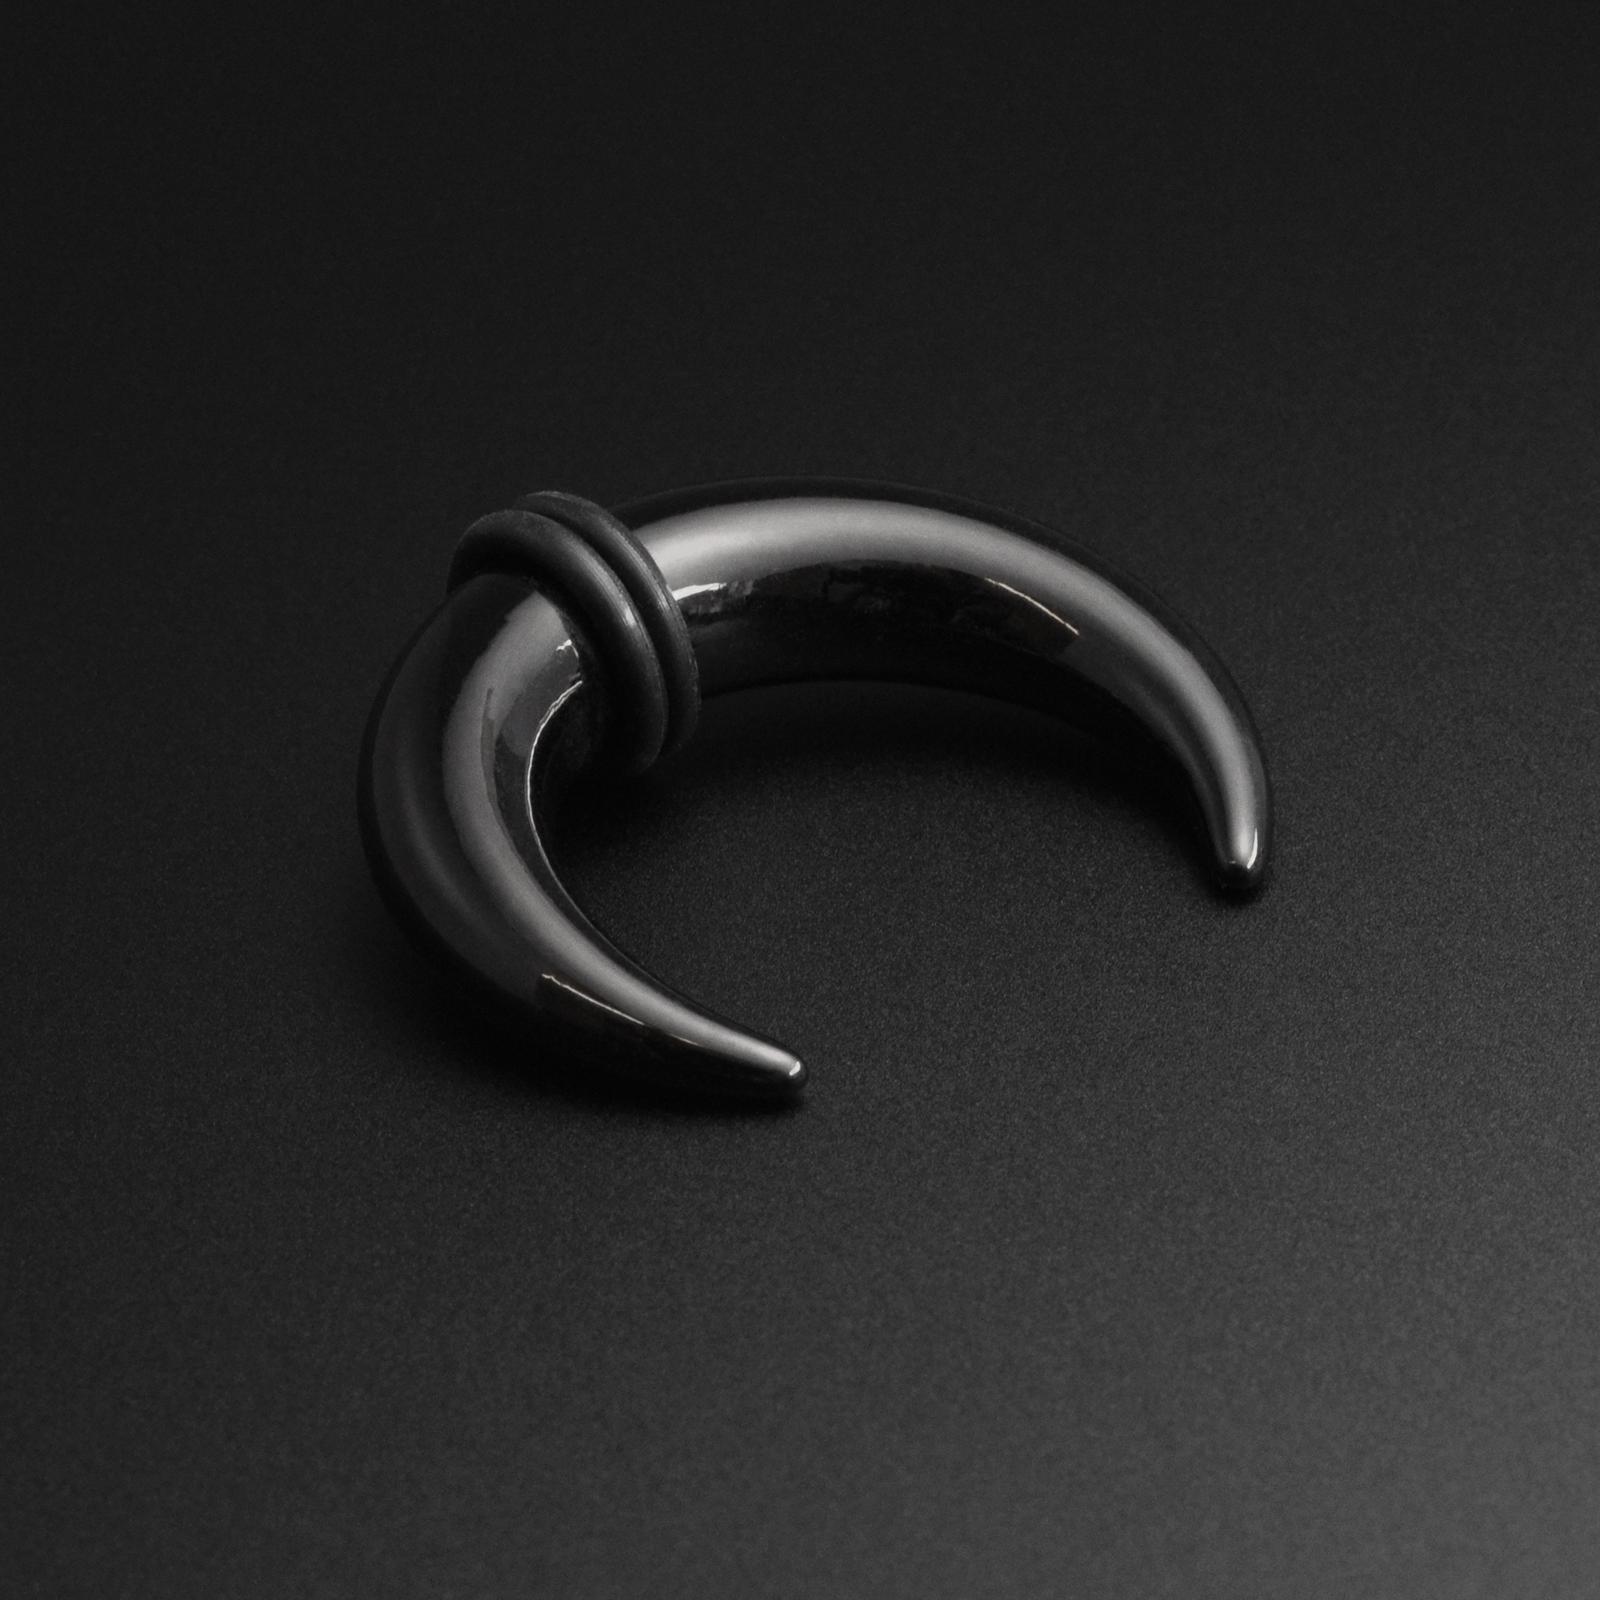 Ear Pincher Septum Stretching KitBlack Acrylic Crescent Stretcher 1.6mm-10mm